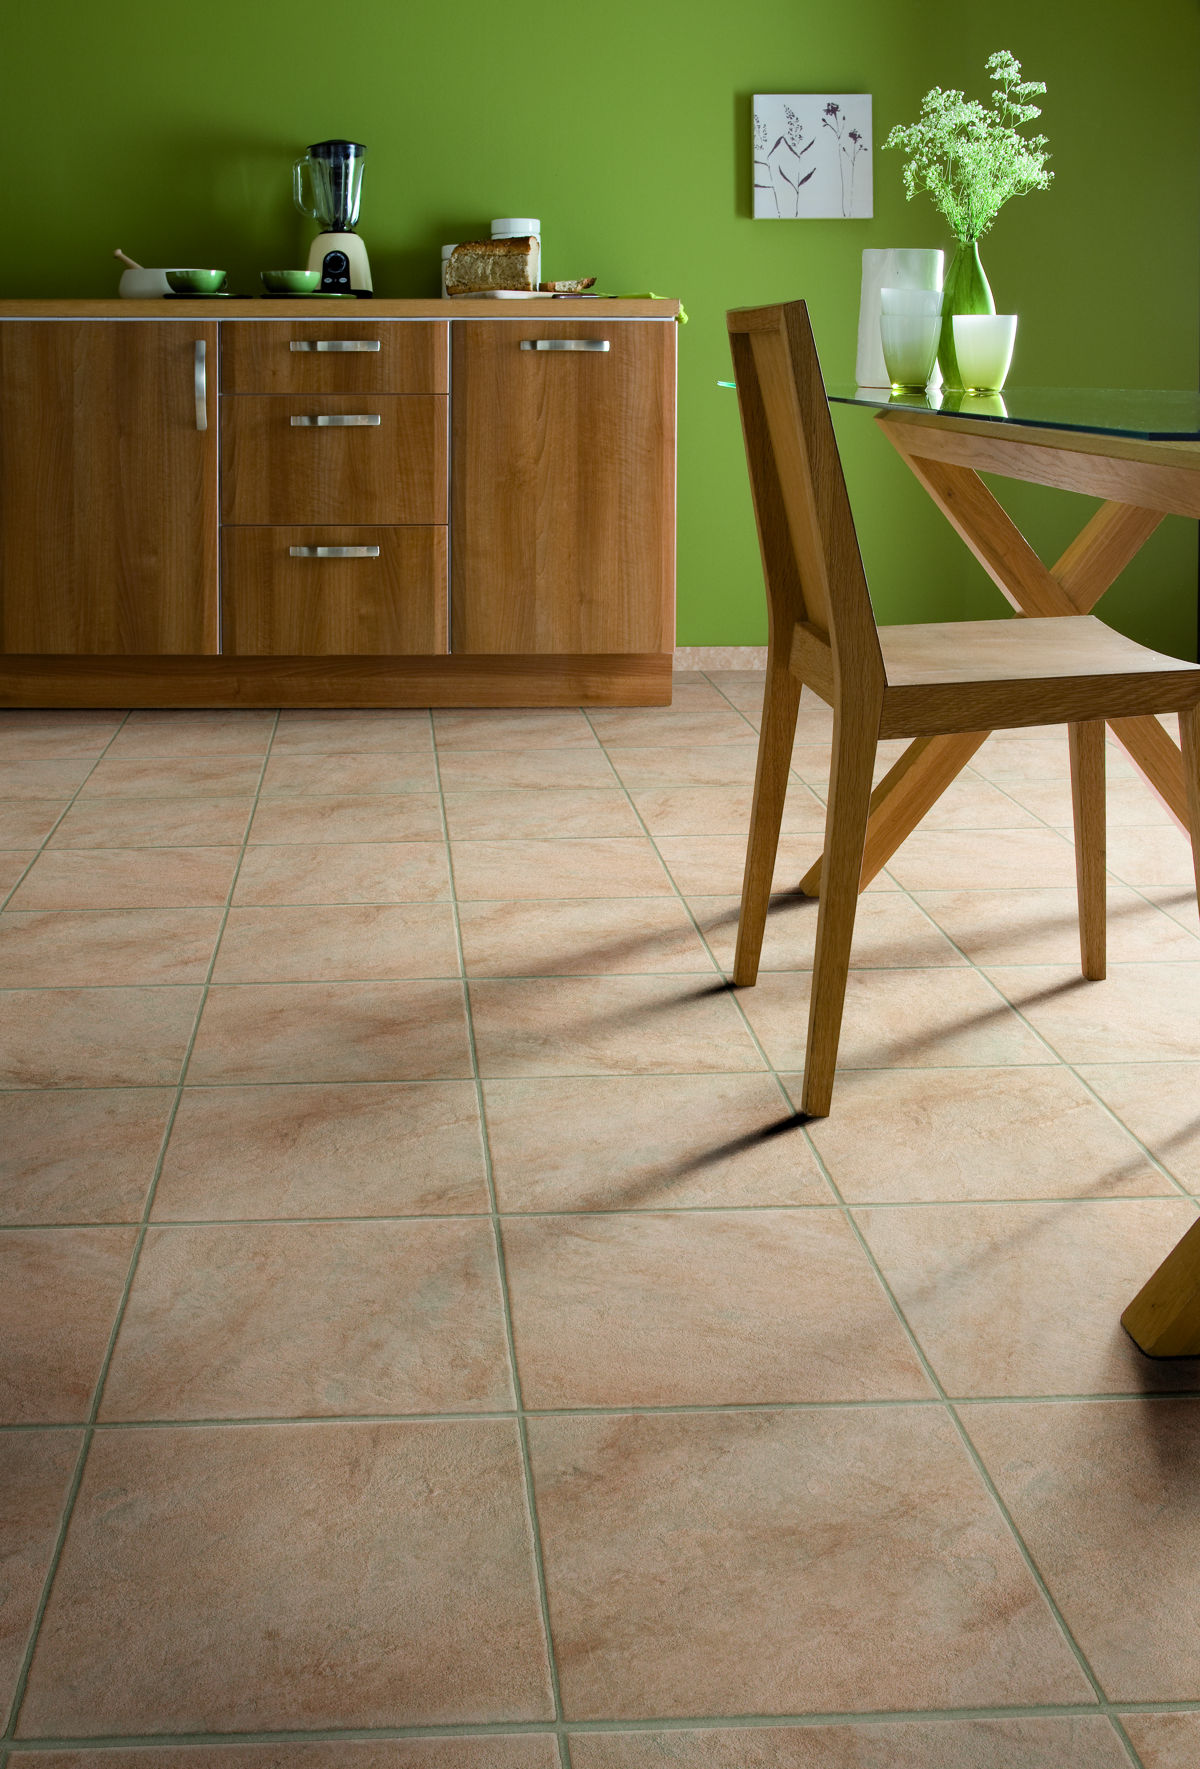 Laminate flooring tile kronospan stoneline xl moroccan stone laminate flooring dailygadgetfo Gallery